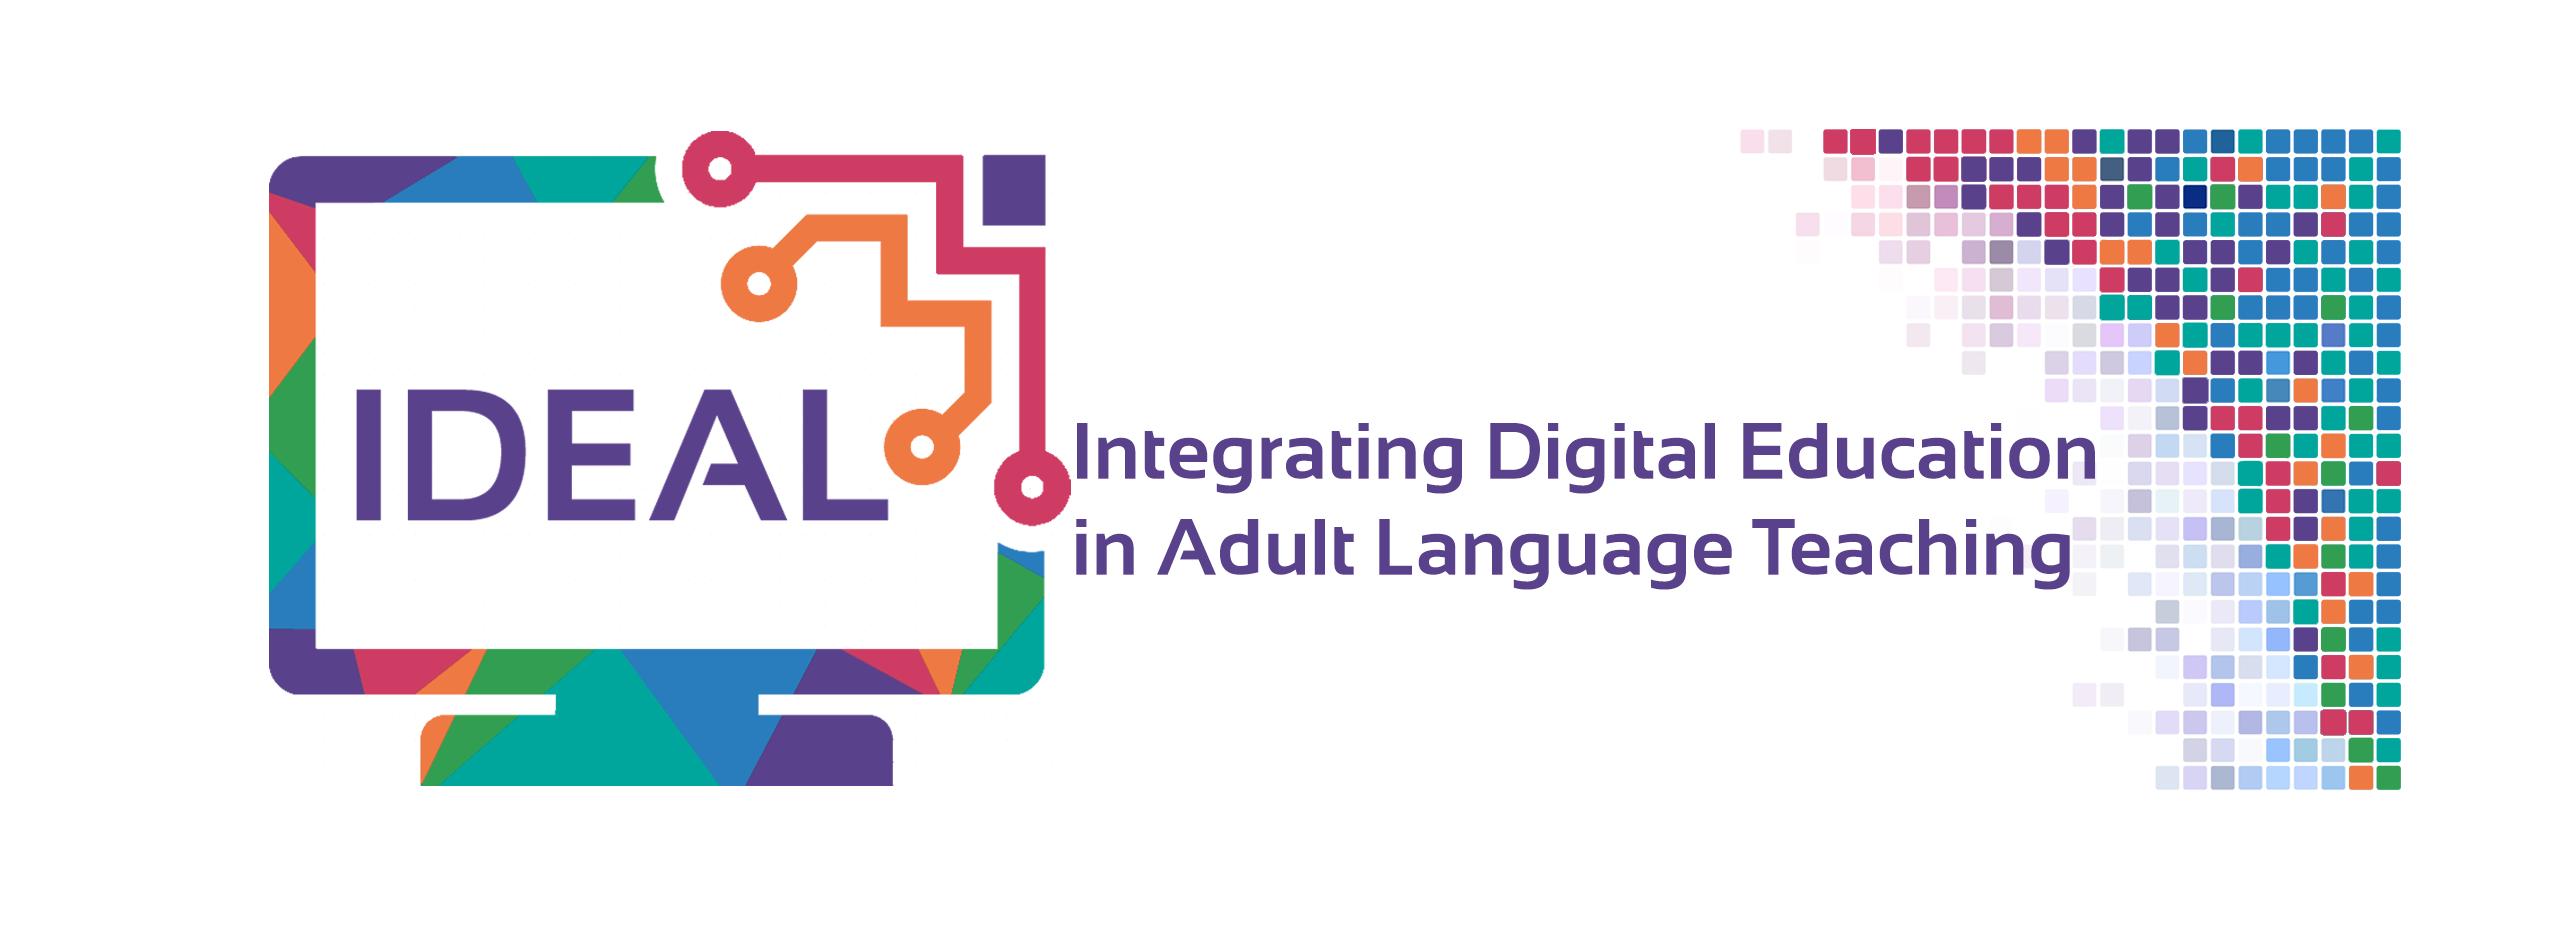 Area 2: Digital Resources - A2